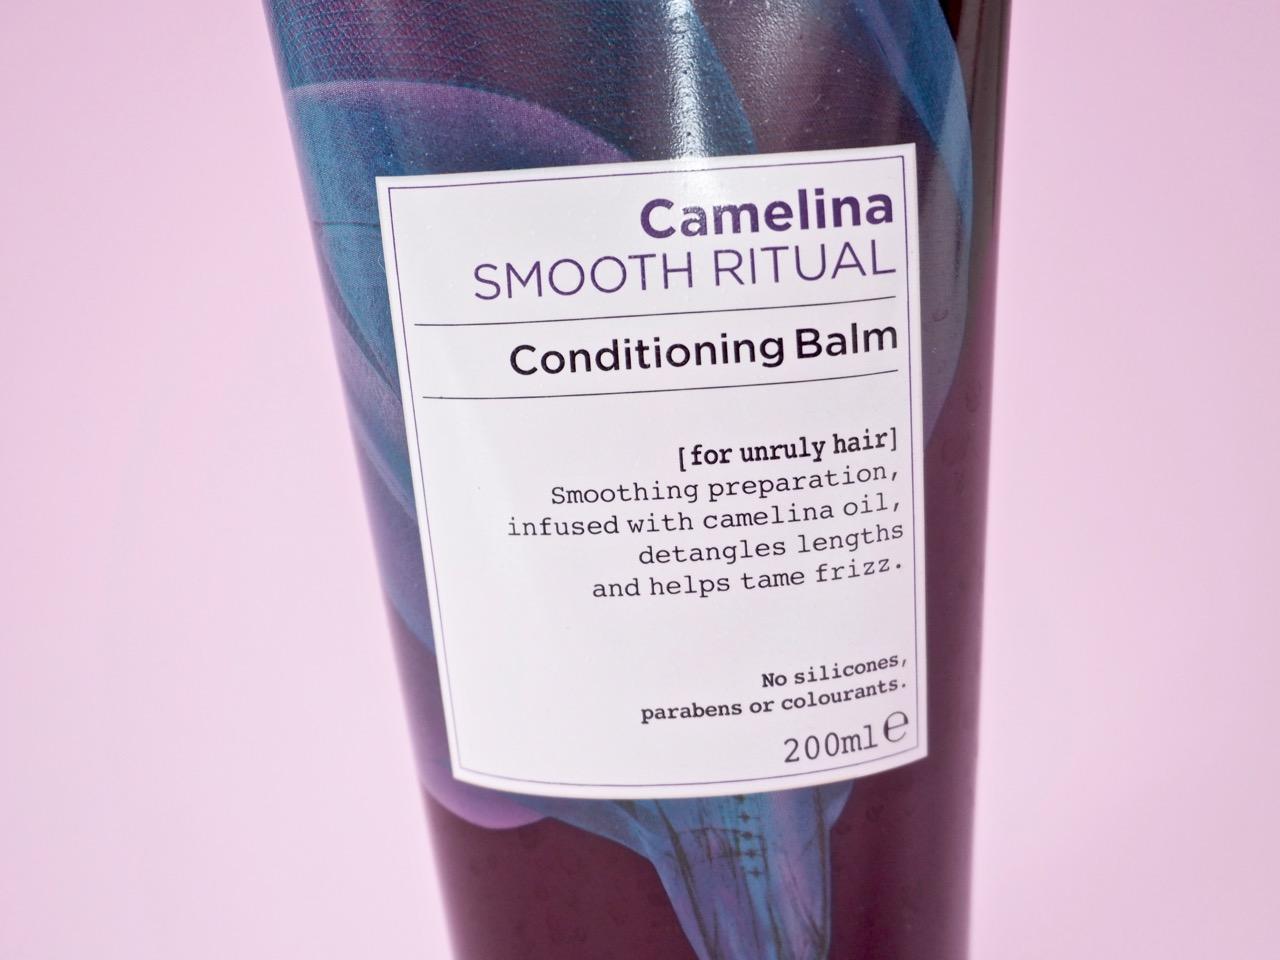 L'Oréal Botanicals Fresh Care Camelia Smooth Ritual Conditioning Balm hoitoaine Ostolakossa kokemuksia